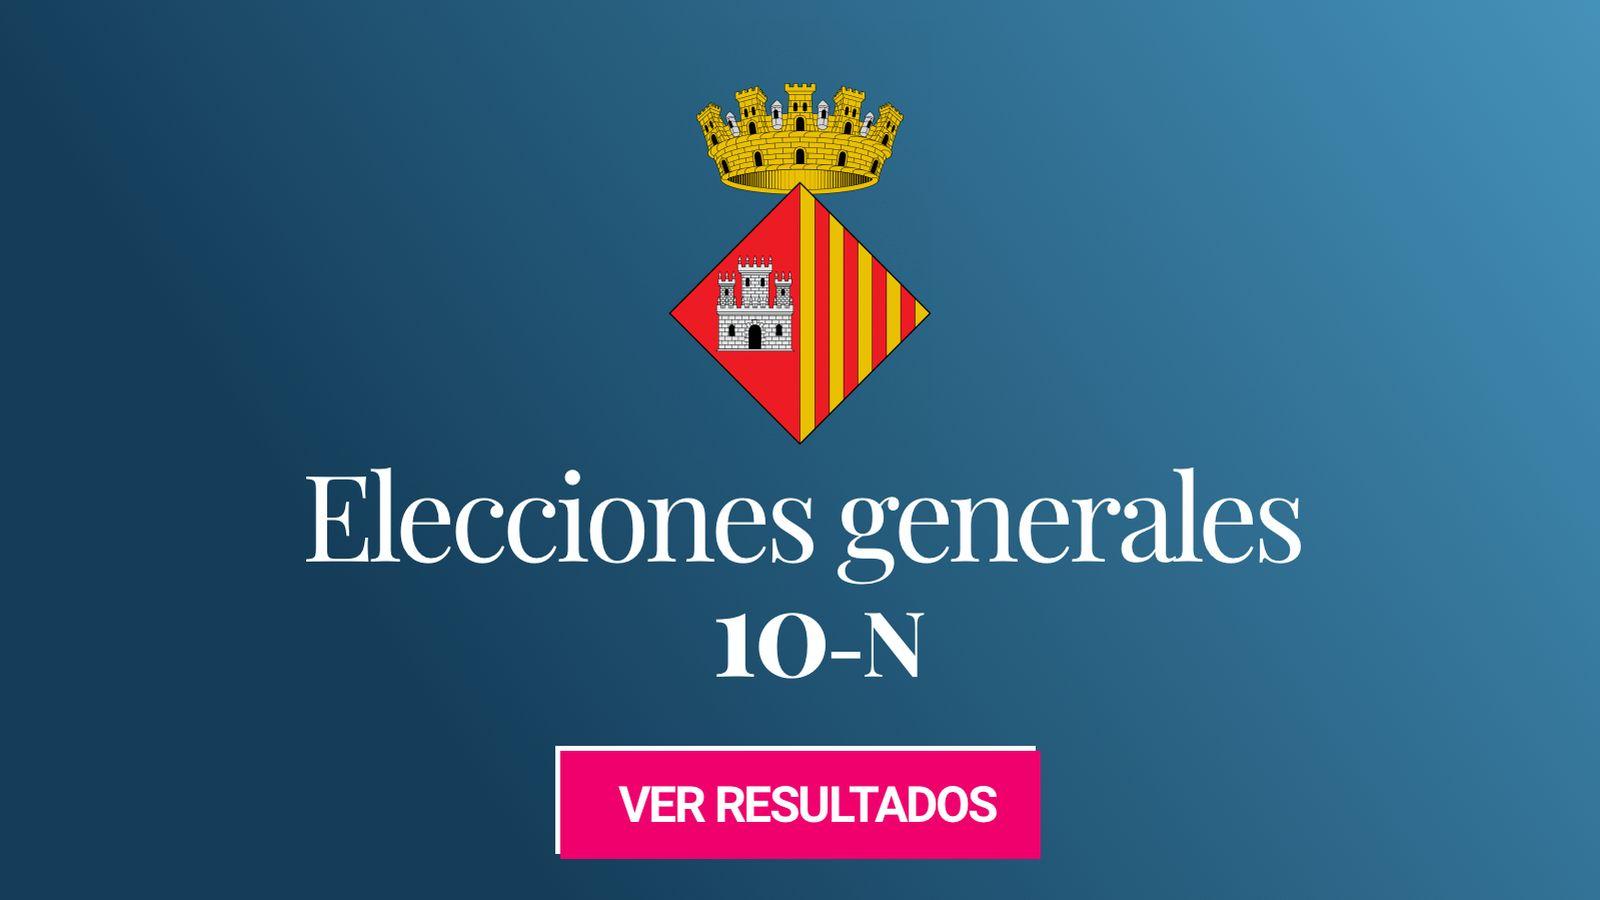 Foto: Elecciones generales 2019 en Terrassa. (C.C./EC)